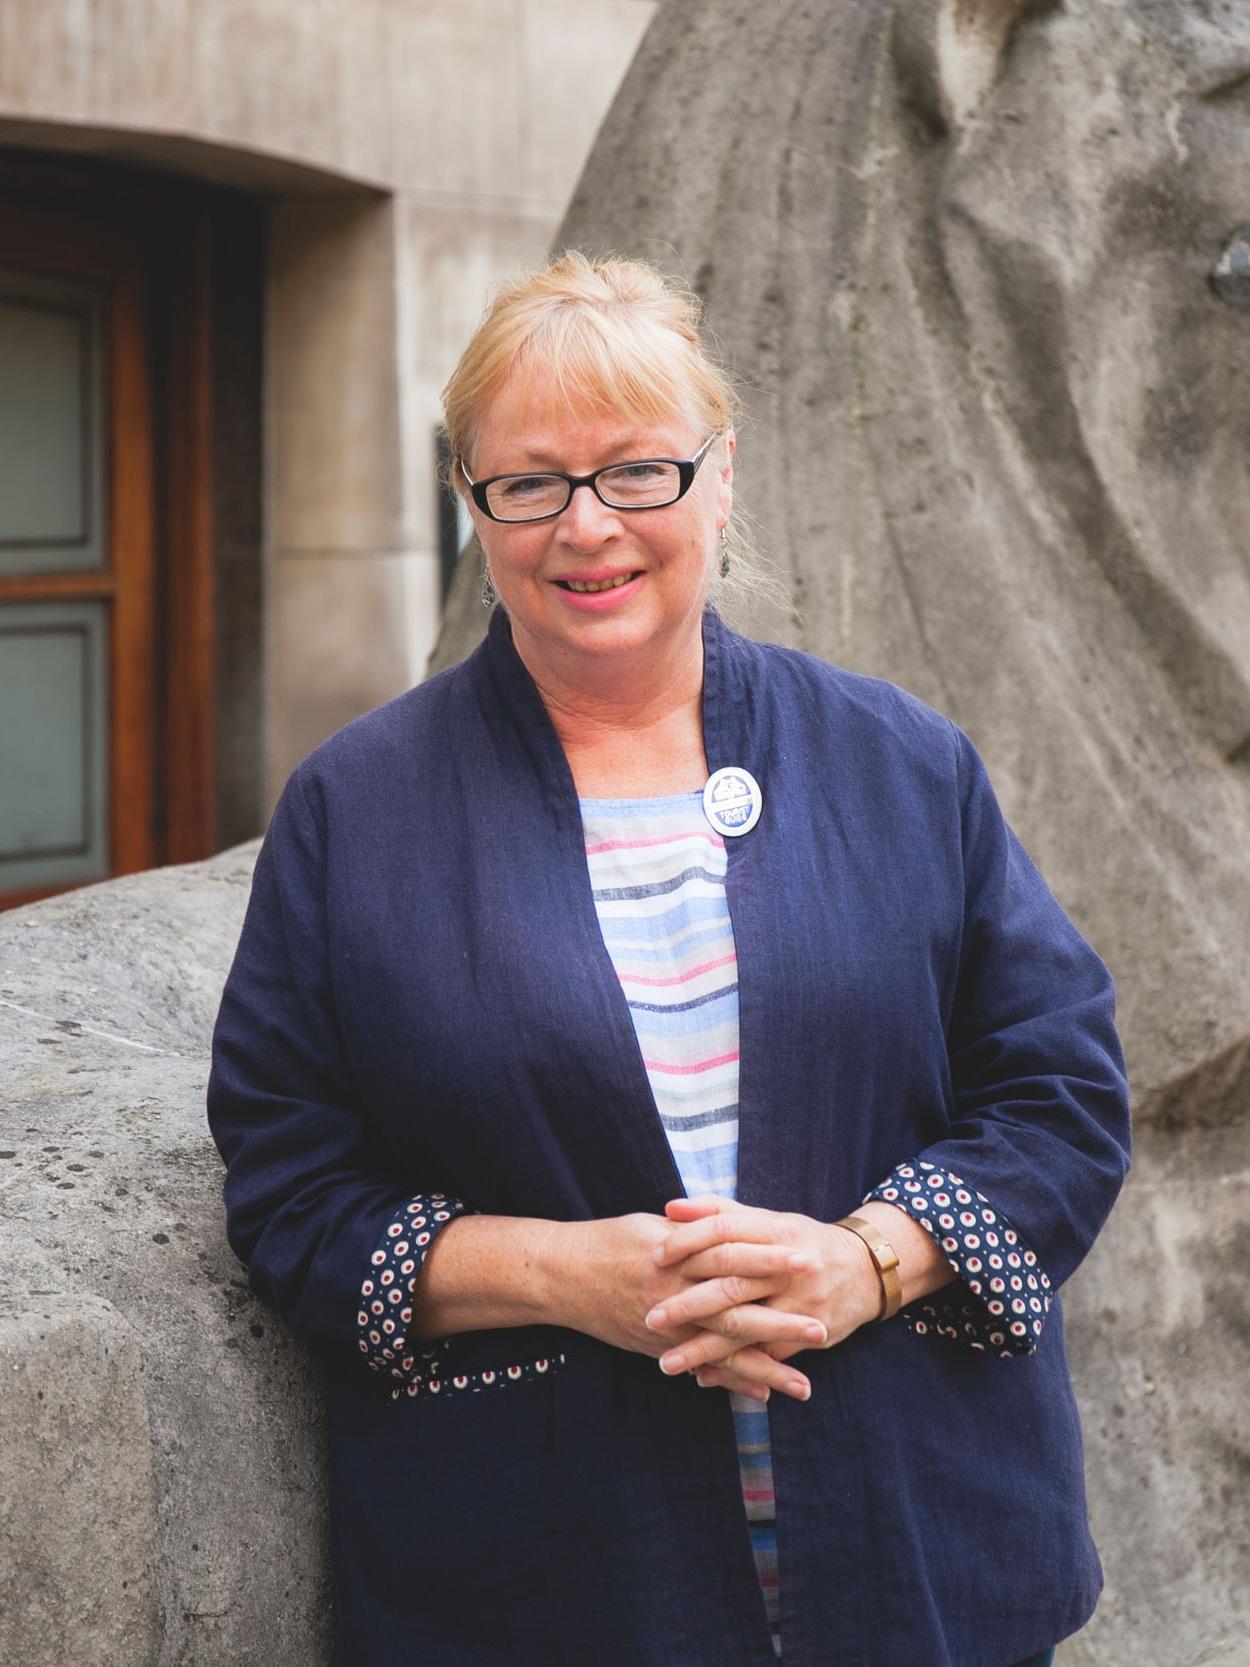 Liz Findlay